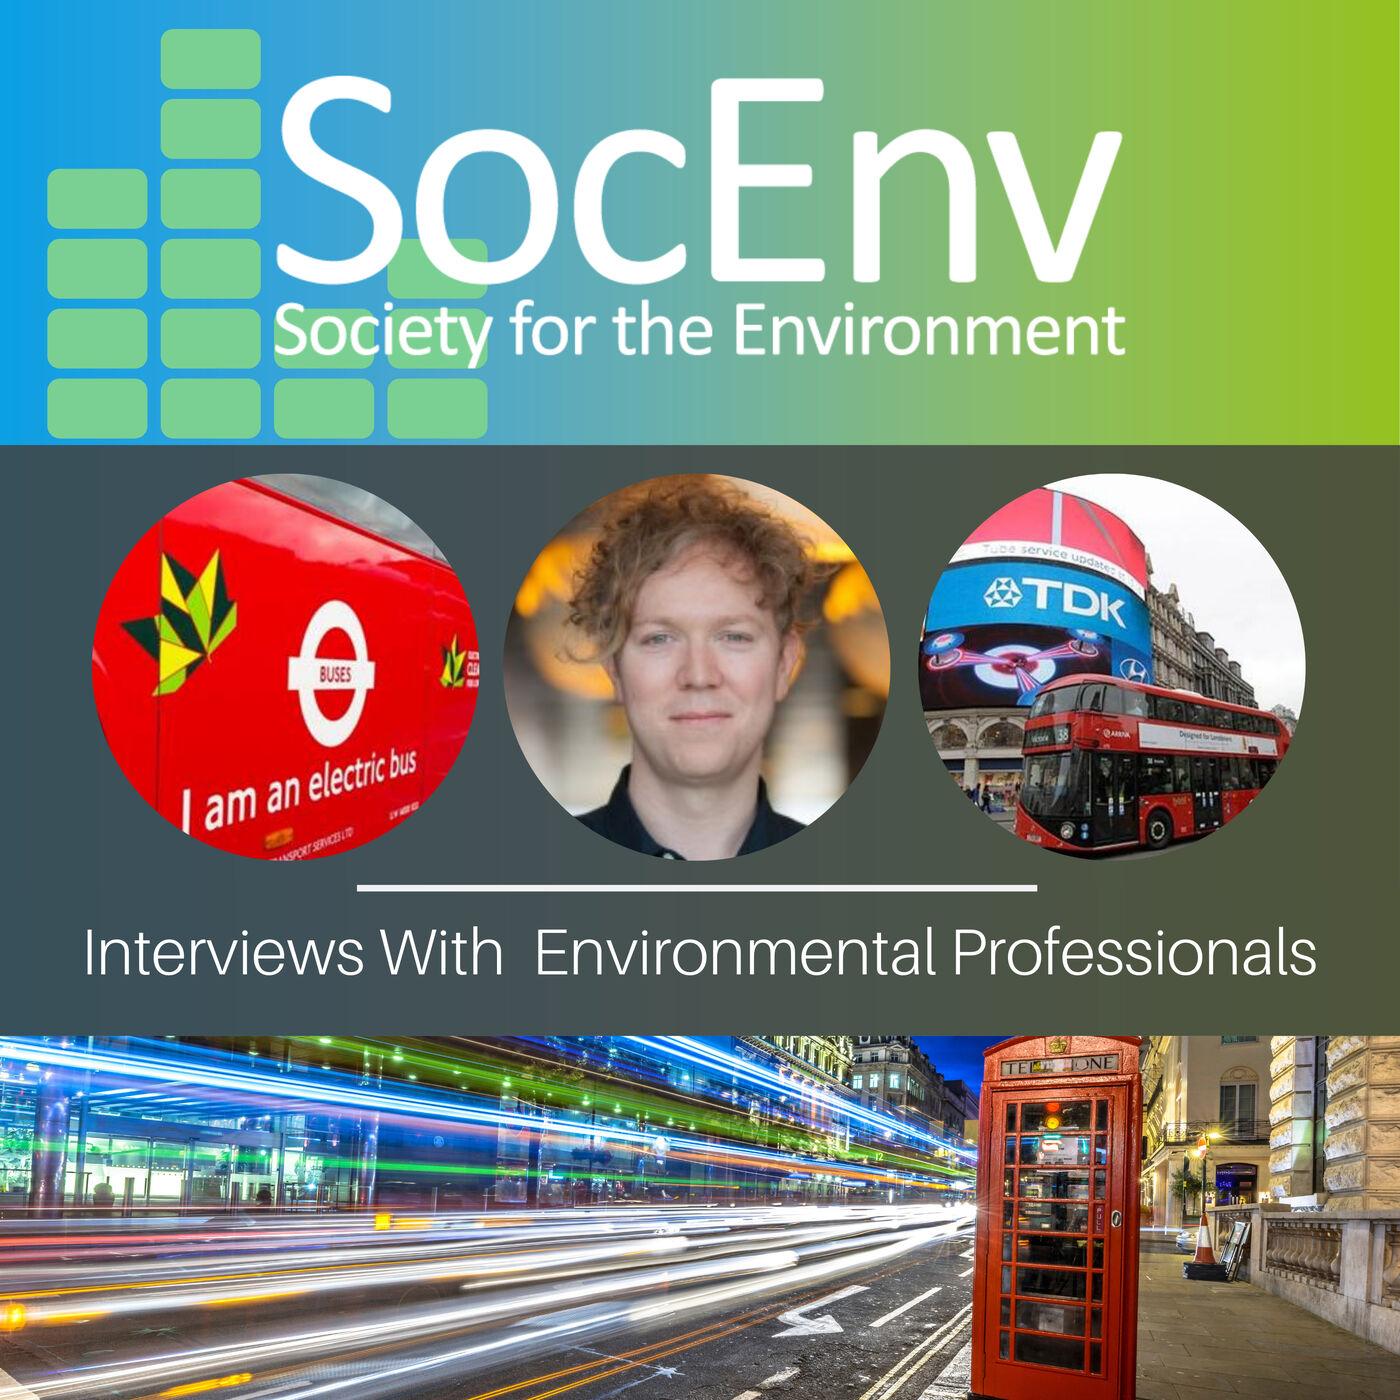 An Interview with Finn Coyle CEng CEnv